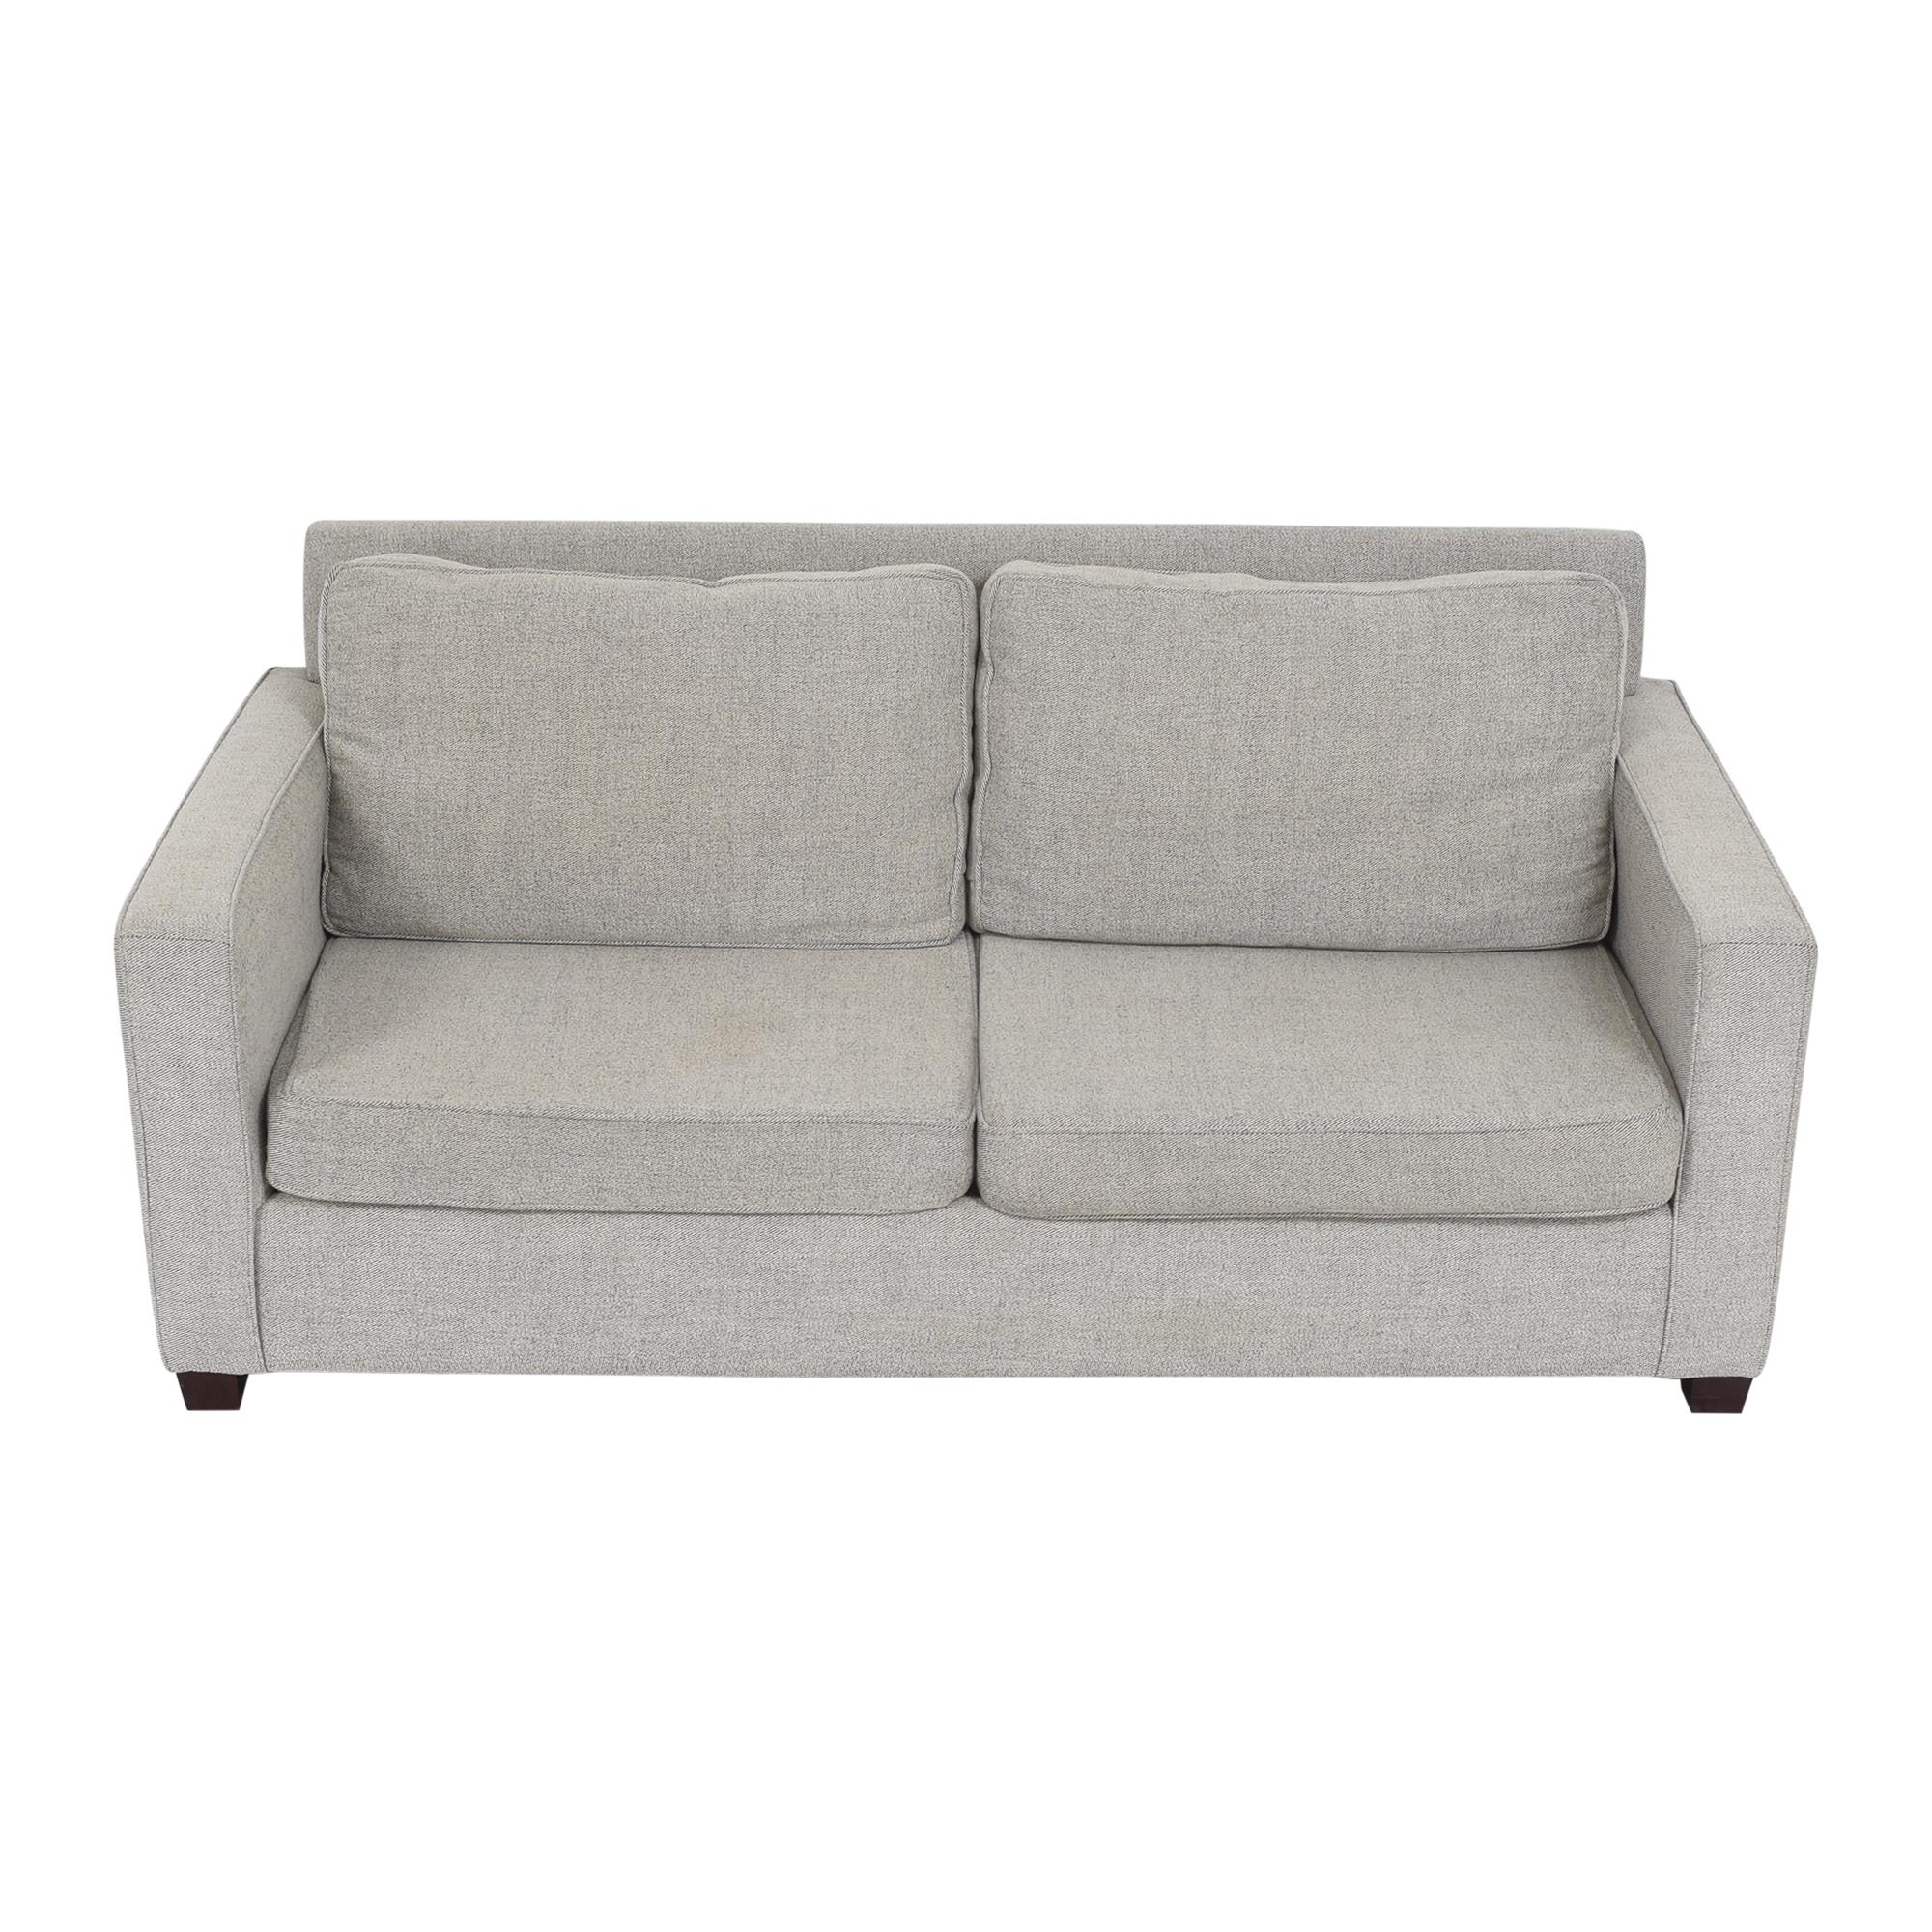 West Elm West Elm Henry Two Cushion Sofa ct